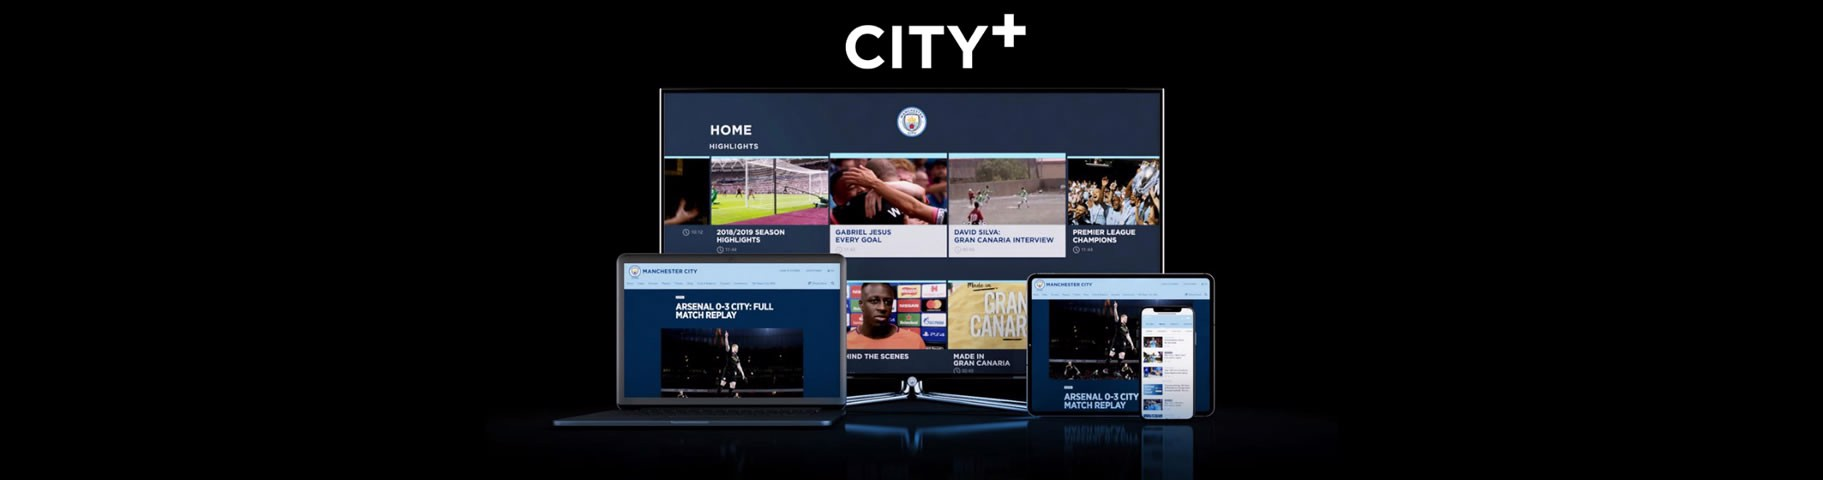 www.mancity.com